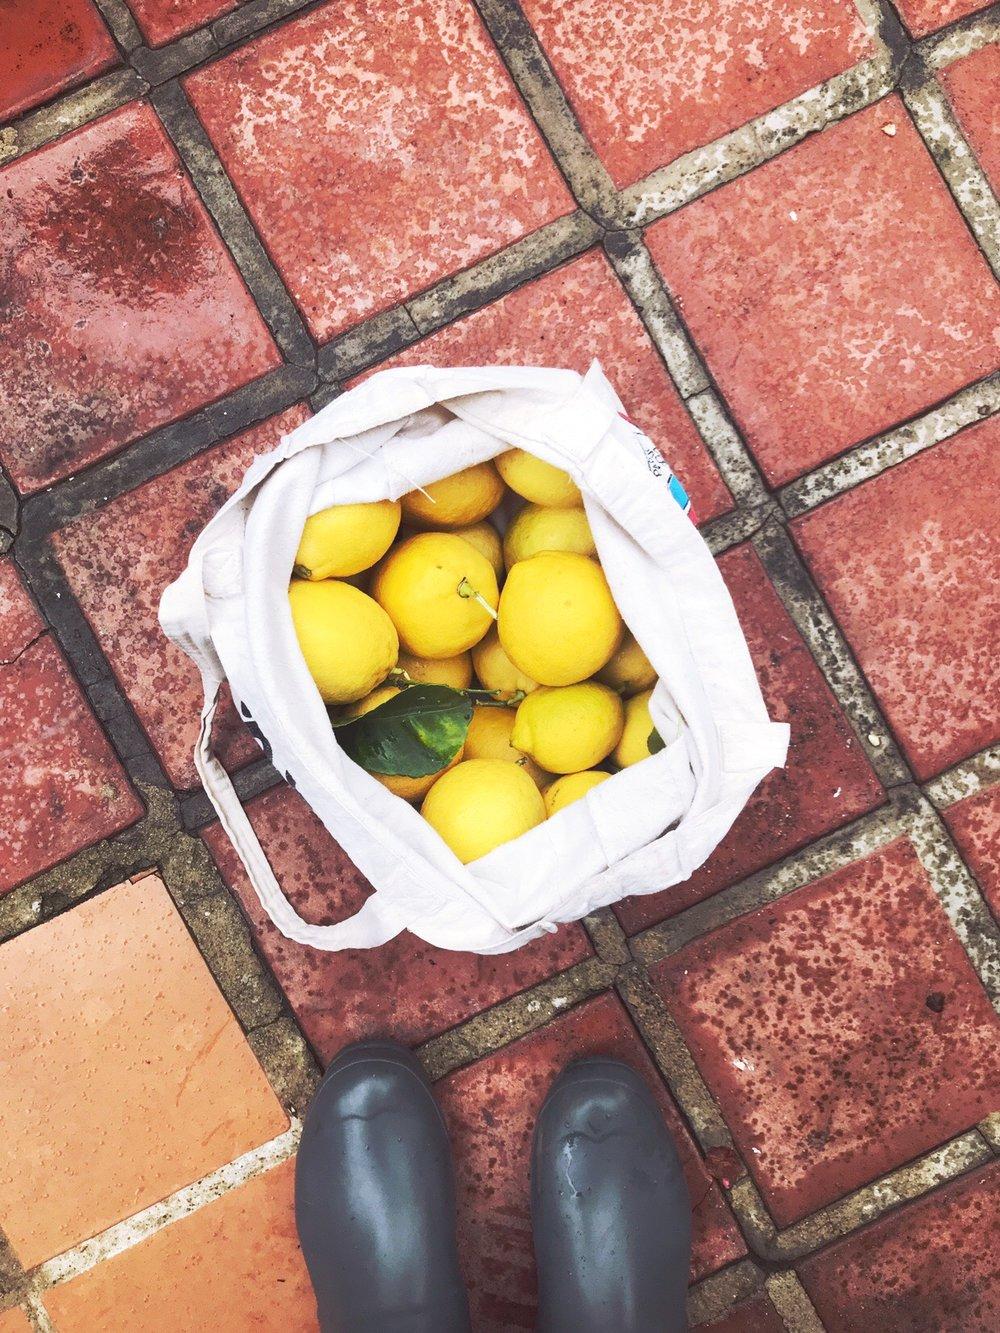 Sunkist_Lemons.JPG